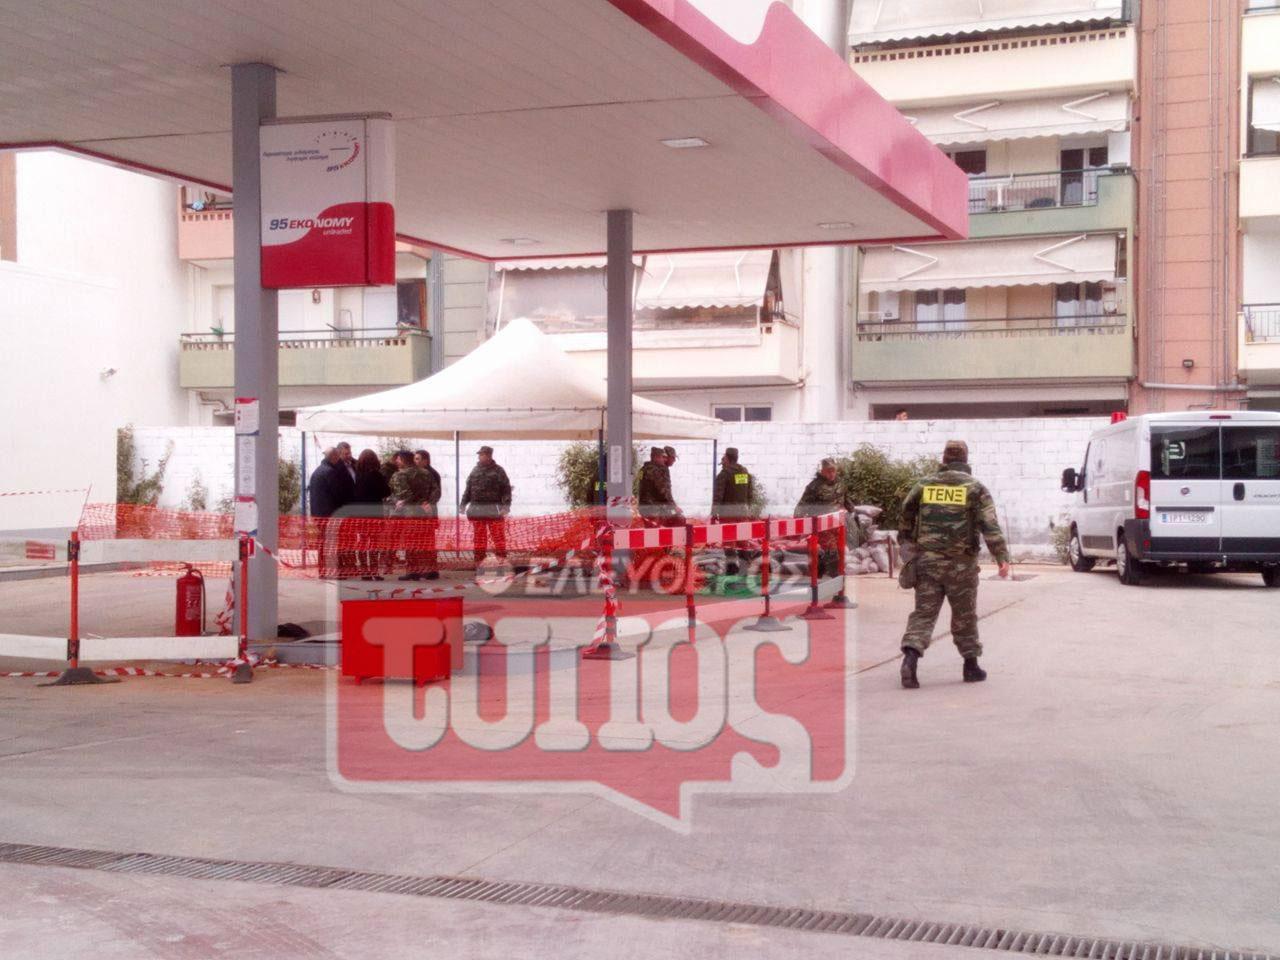 purotexnourgoi-vomva-3 Λήξη συναγερμού στο Κορδελιό - Επιστρέφουν οι κάτοικοι